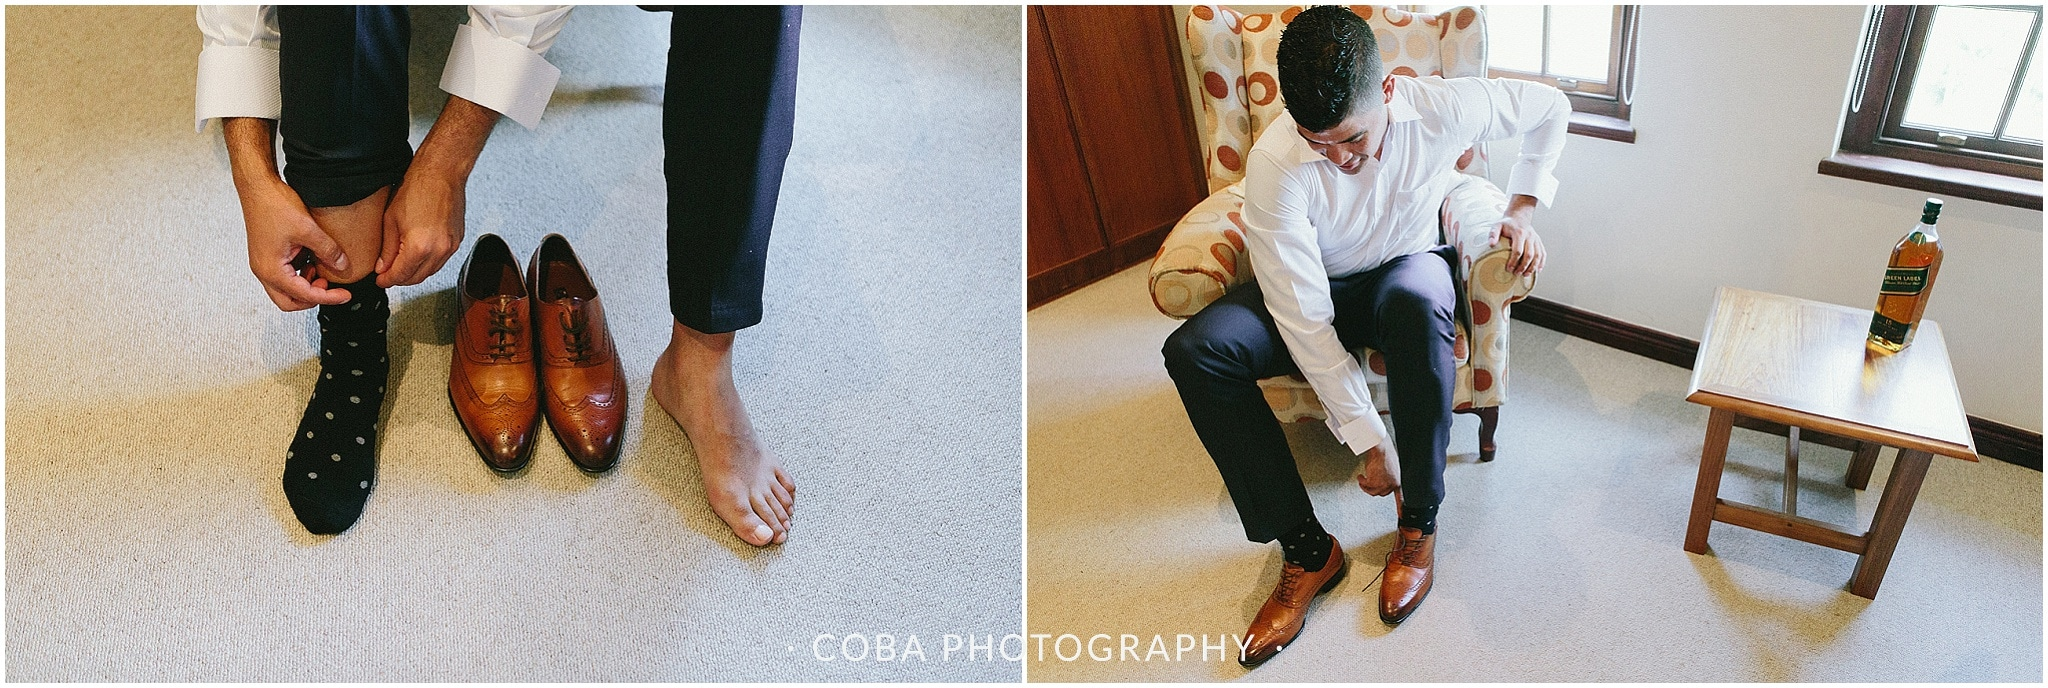 Fernando & Taime - Bakenhof - Coba Photography (23)